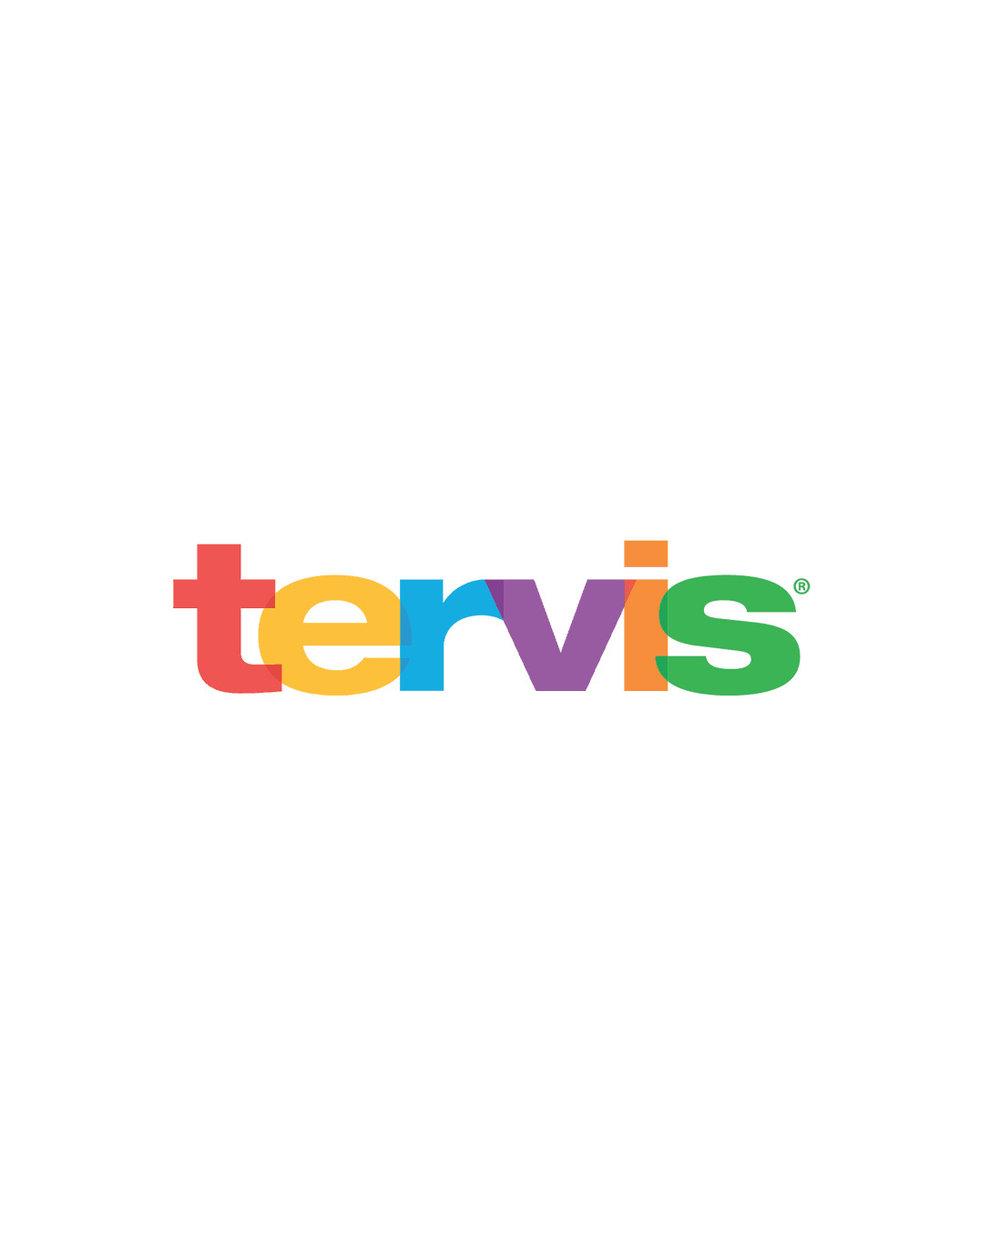 Promo Logos - Tervis.jpg